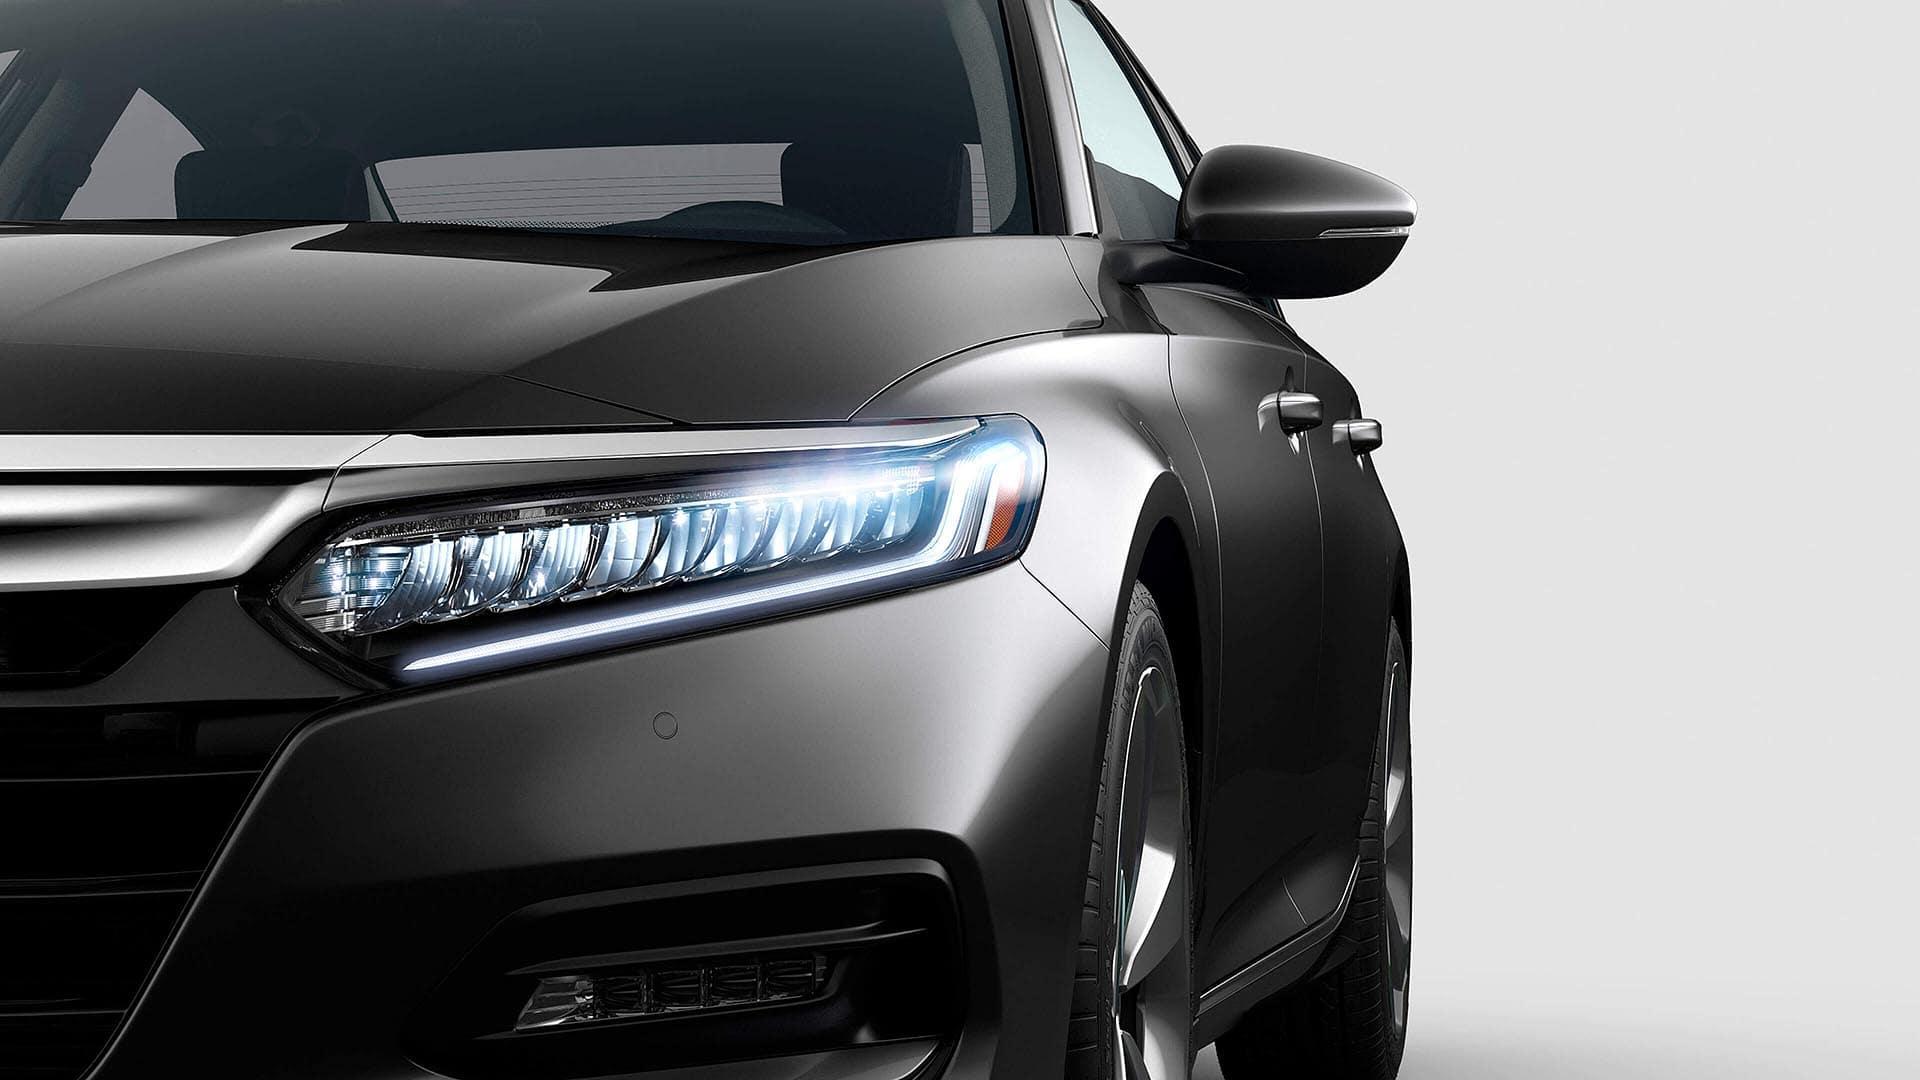 accord sedan port scotia nova inventory in en touring hawkesbury used vehicle honda